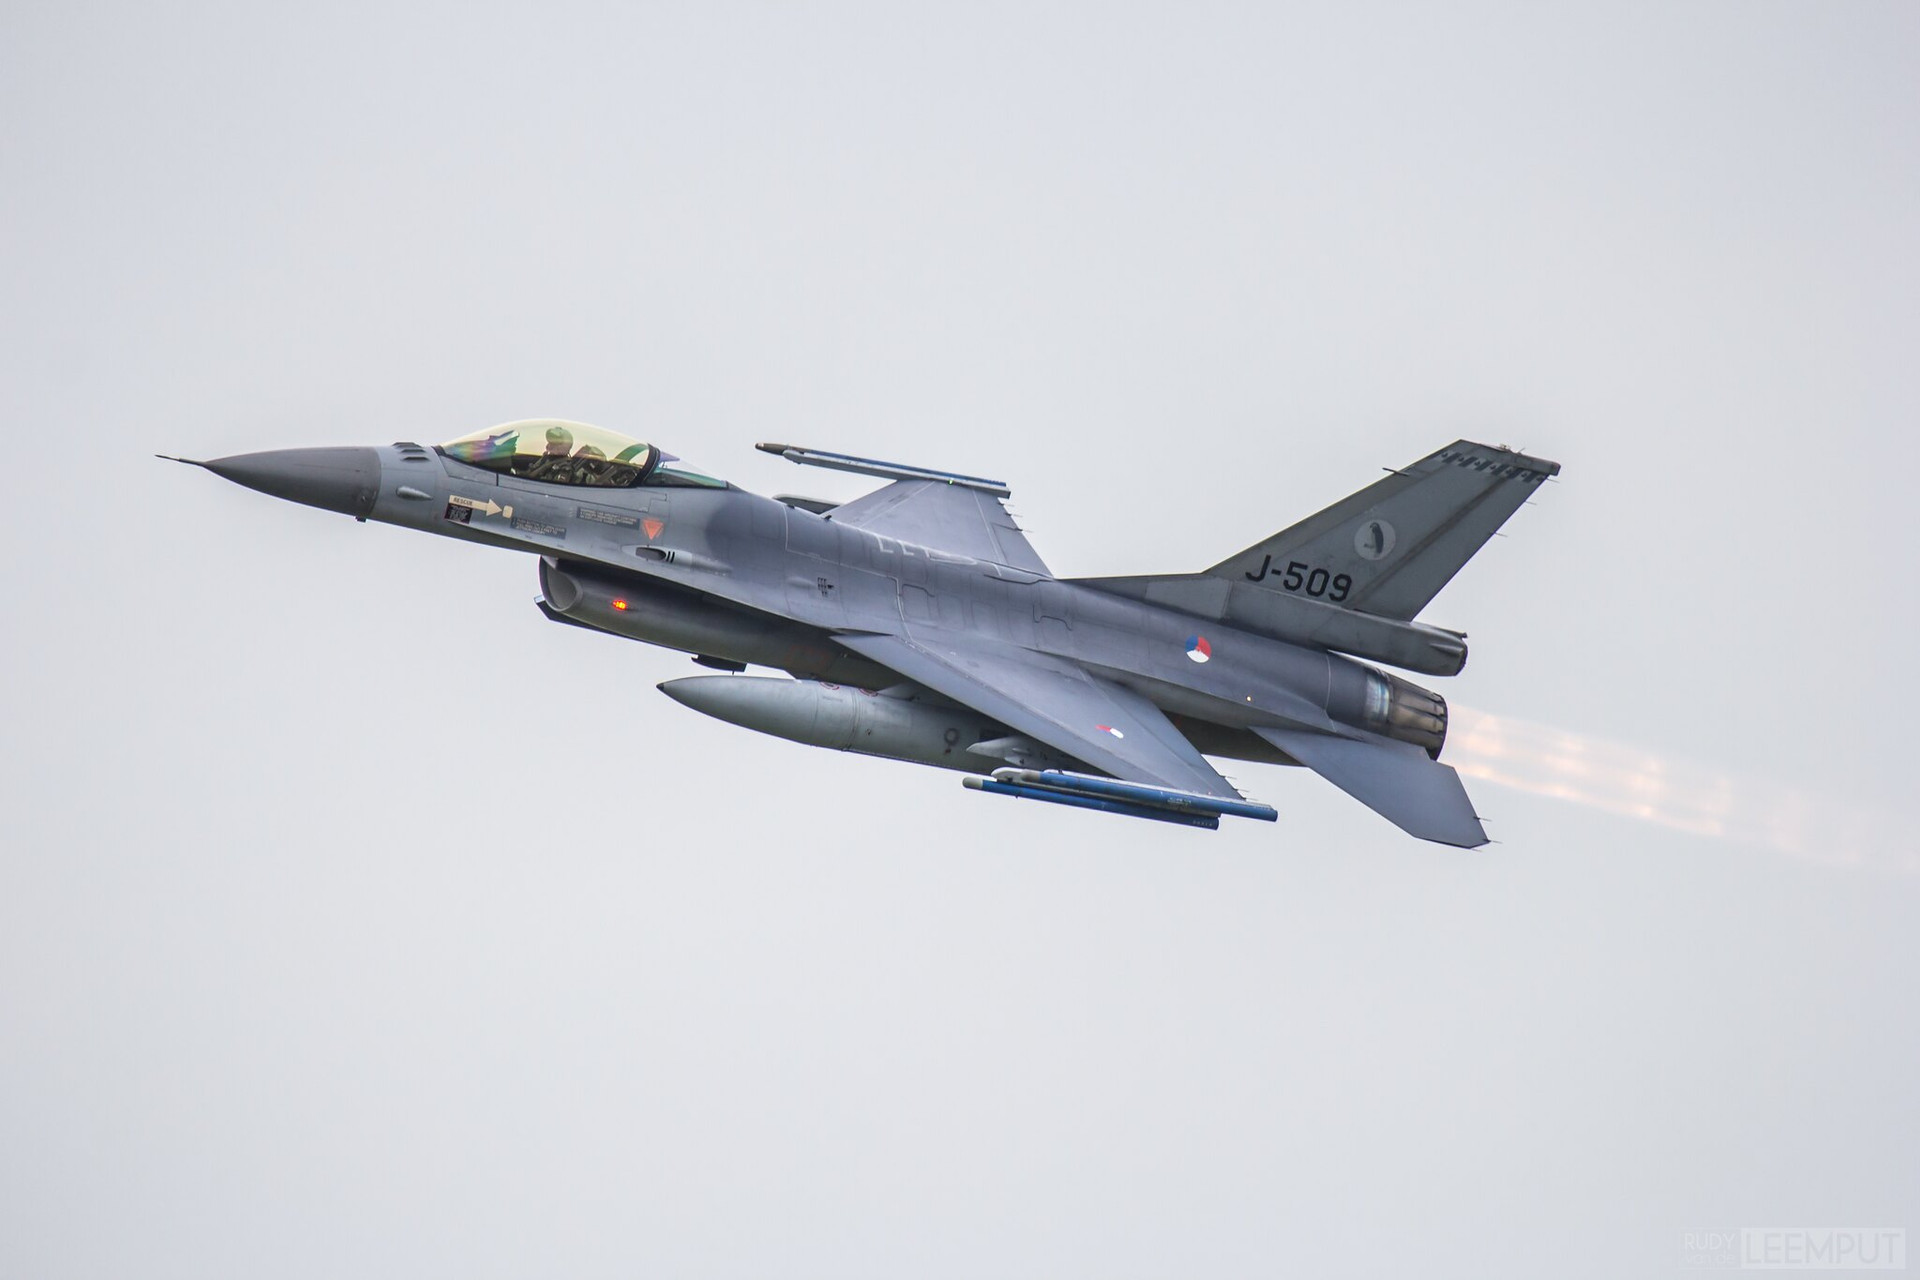 J-509   Build: 1989 - Lockheed F-16 A Fighting Falcon